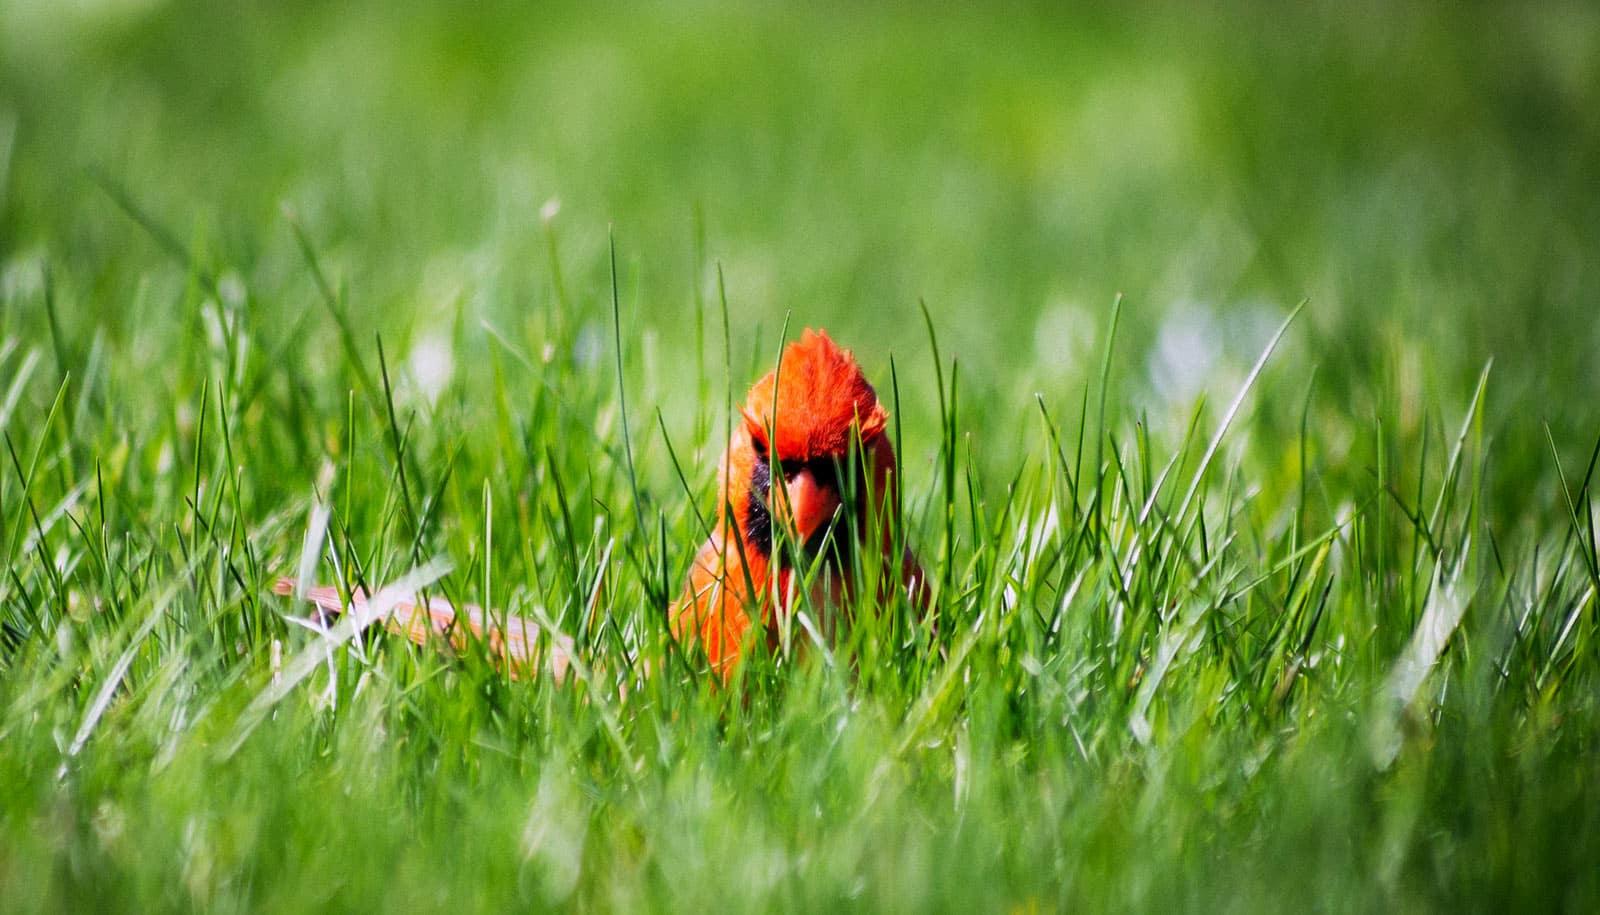 Gene mutation may turn cardinals yellow - Futurity